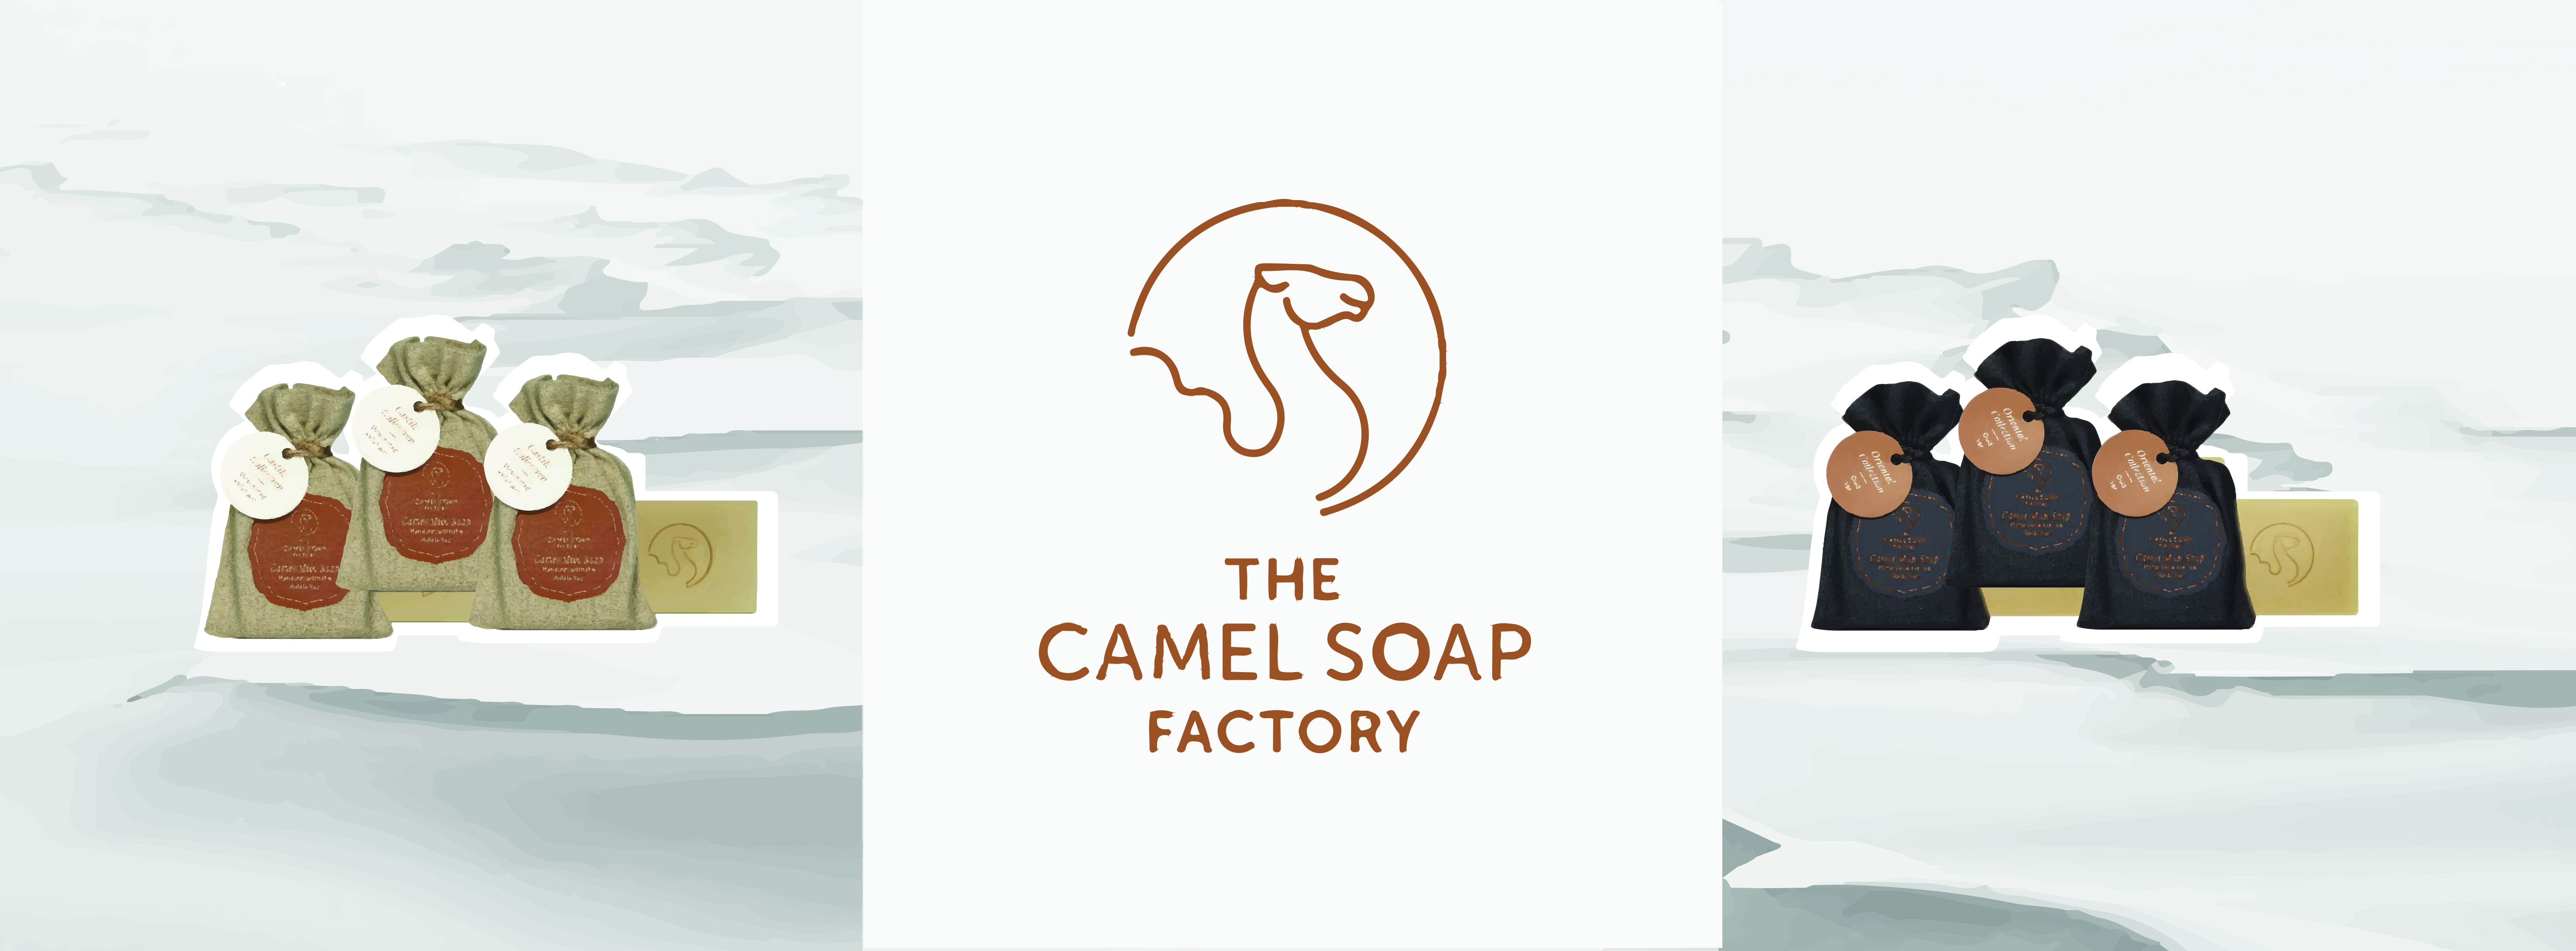 Dubai camel milk handmade soap